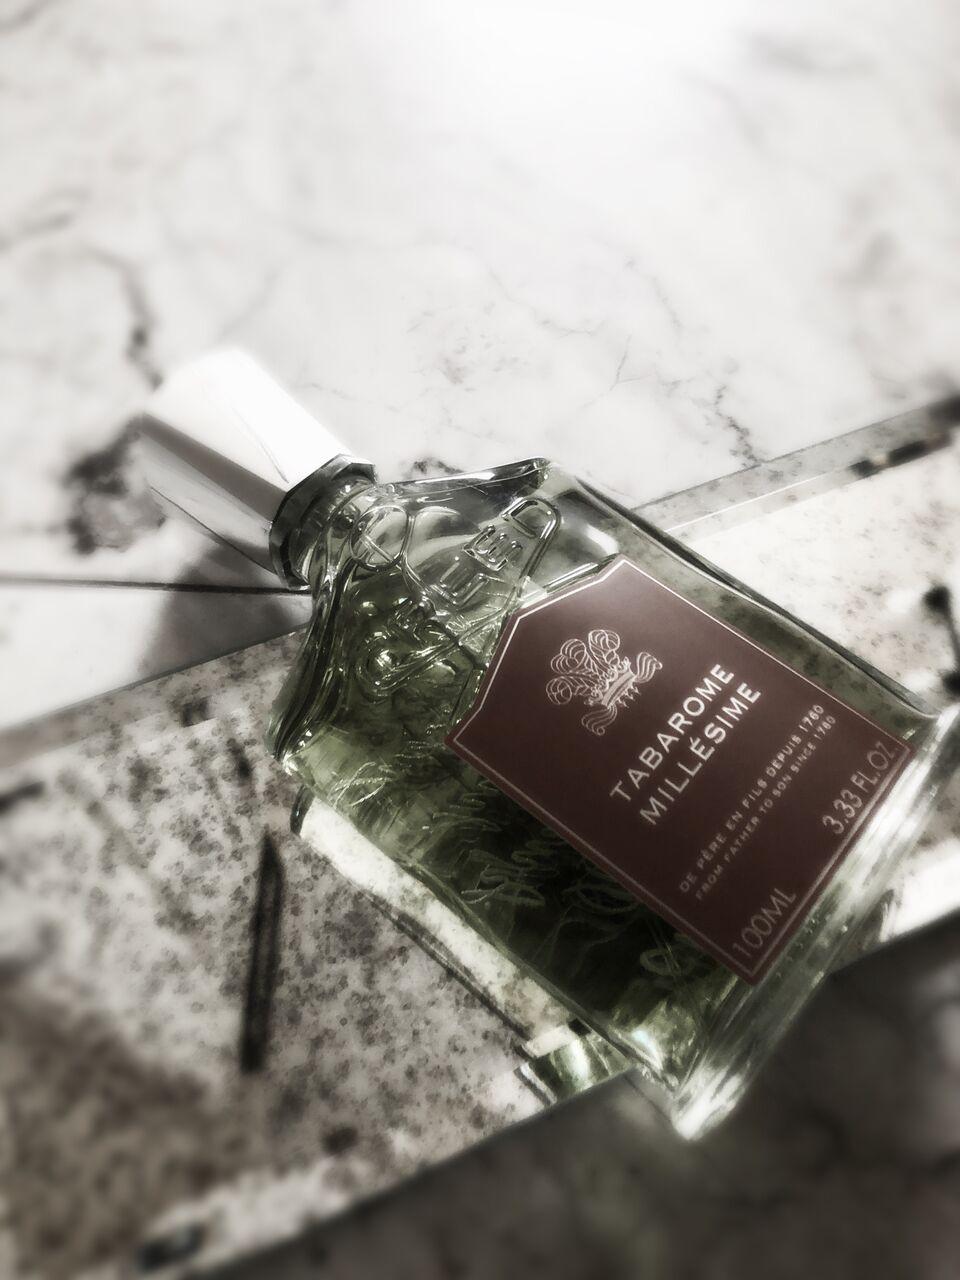 fragrance cologne perfume engraving houston 2019 creed.jpg